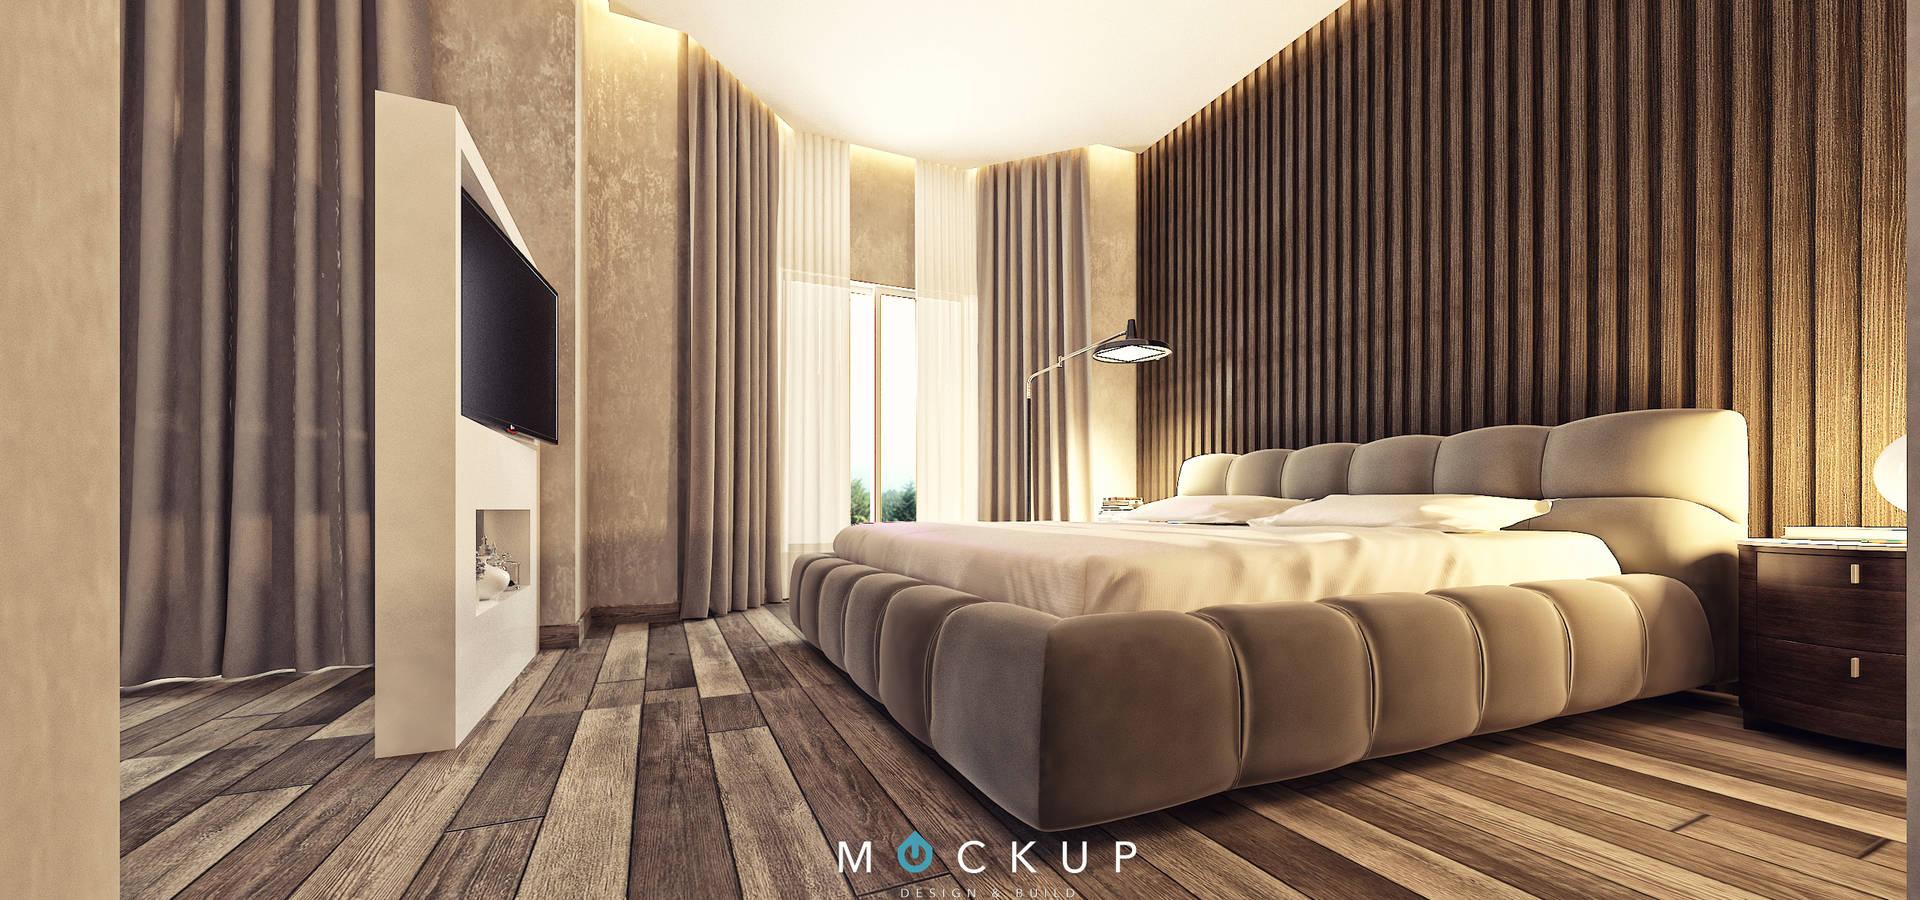 Mockup studio